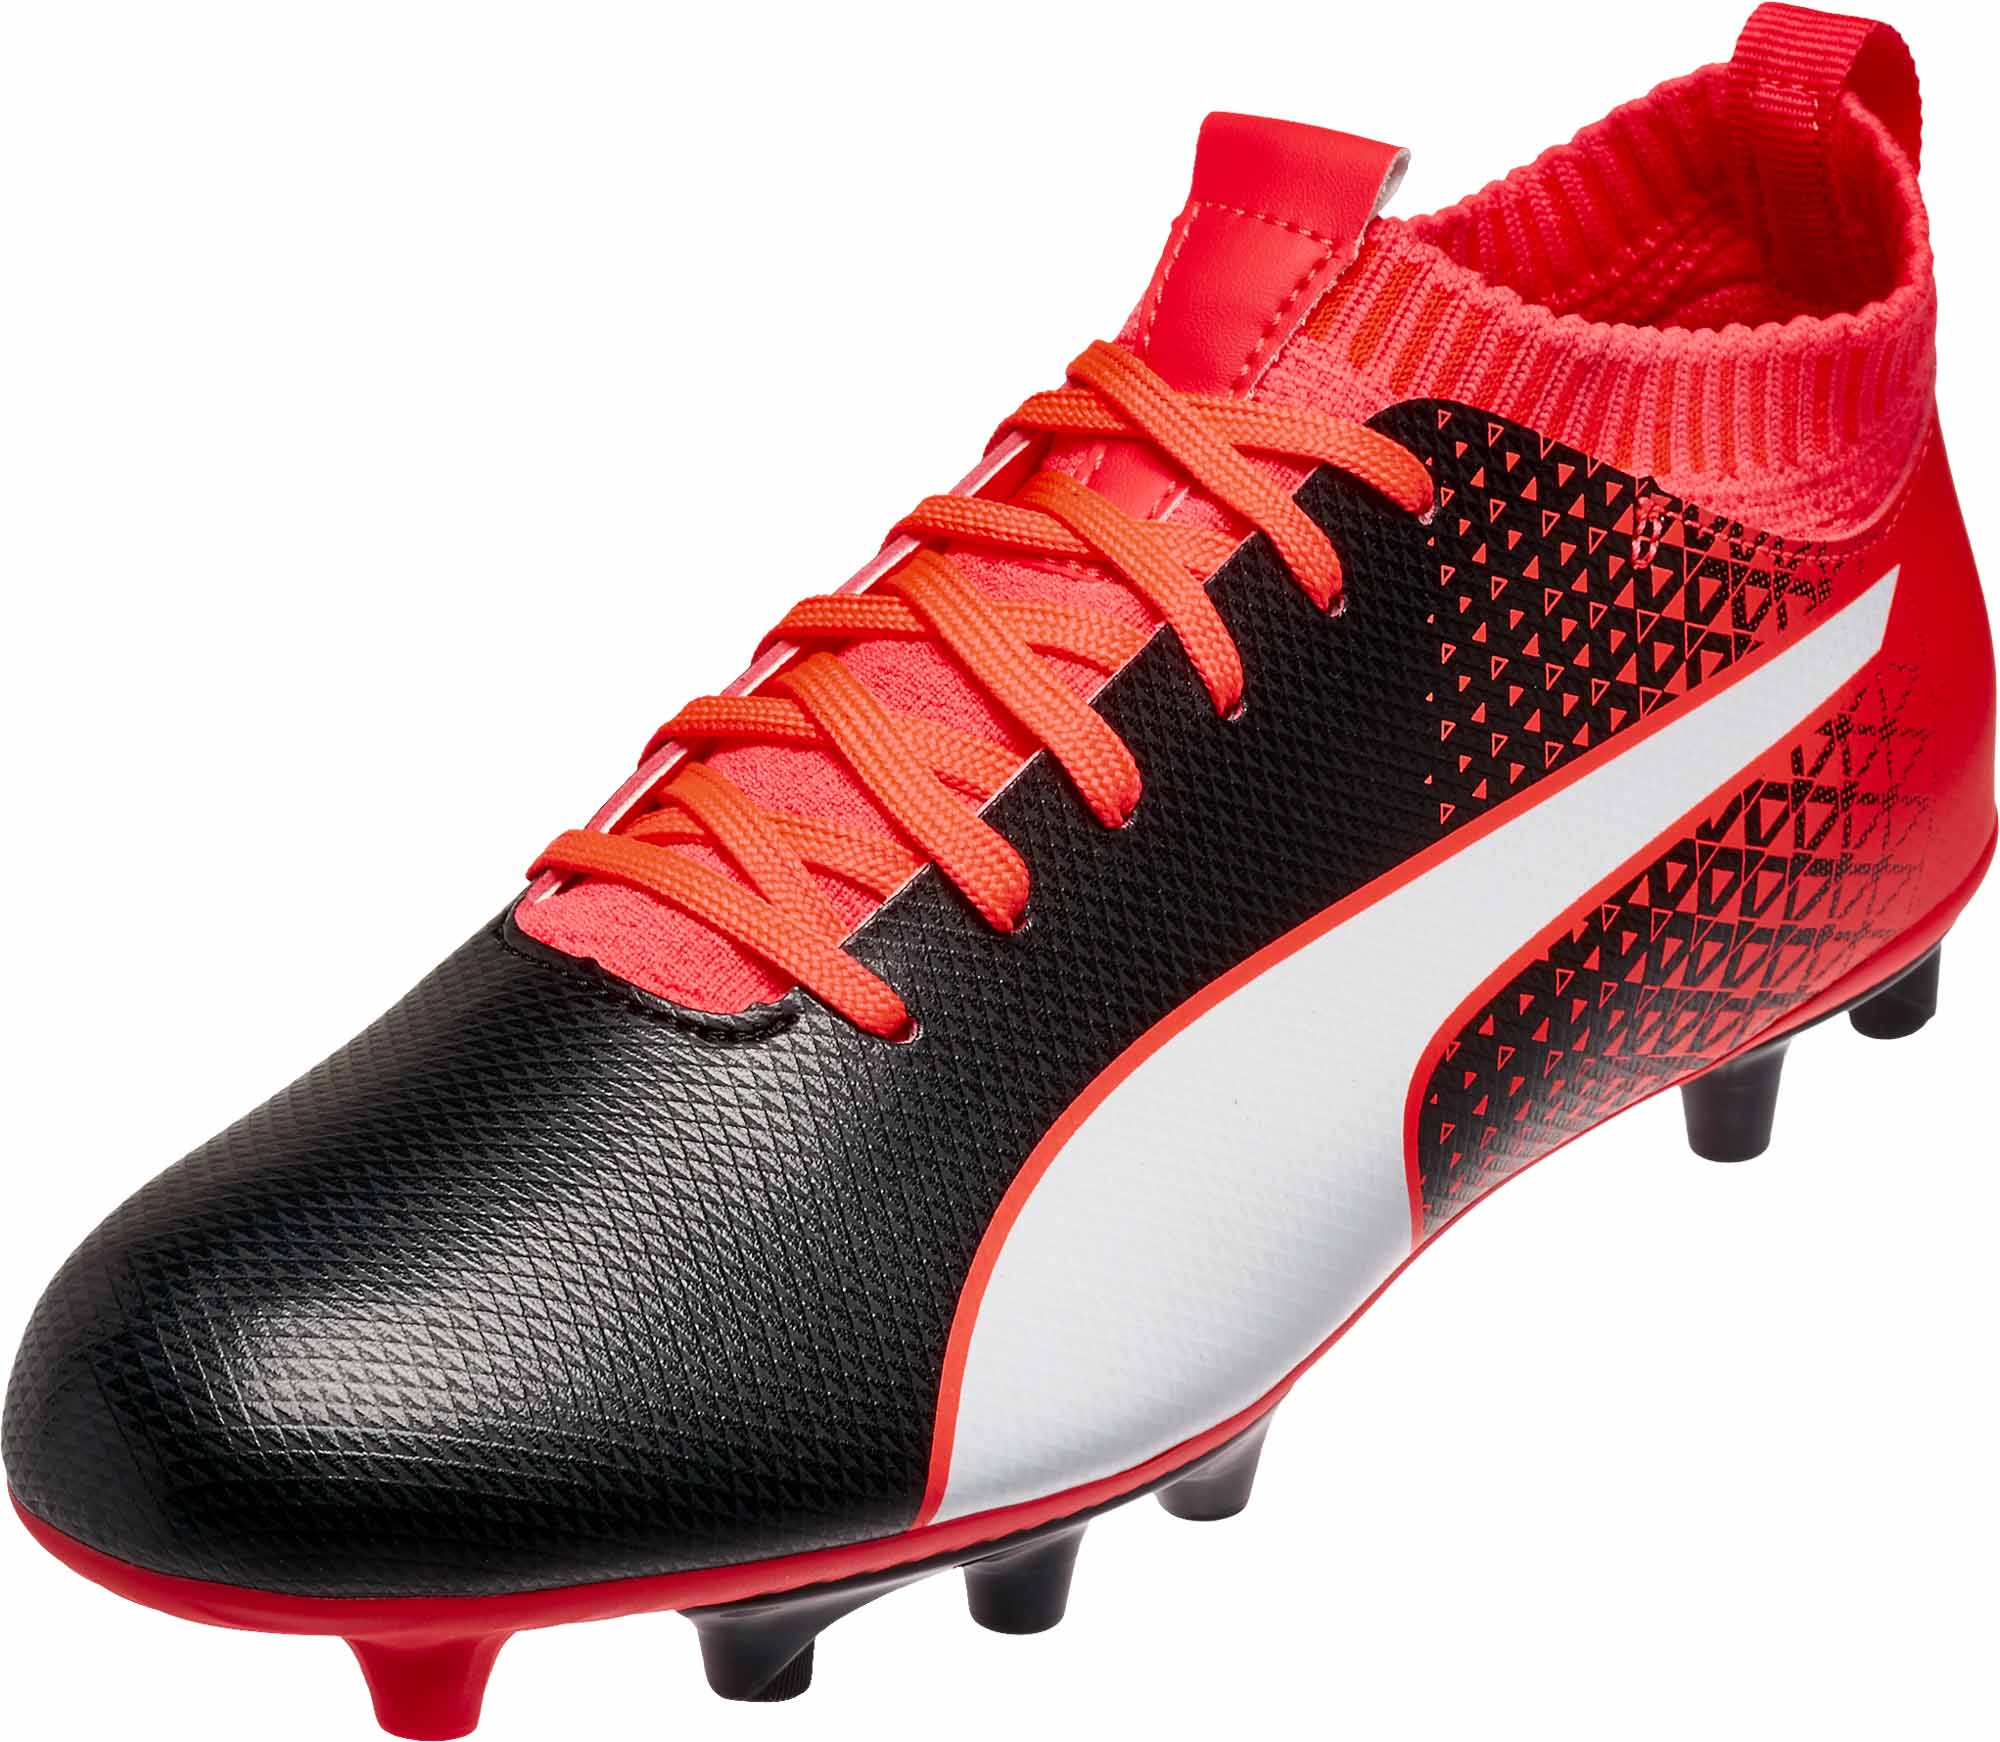 puma soccer shoes 2018